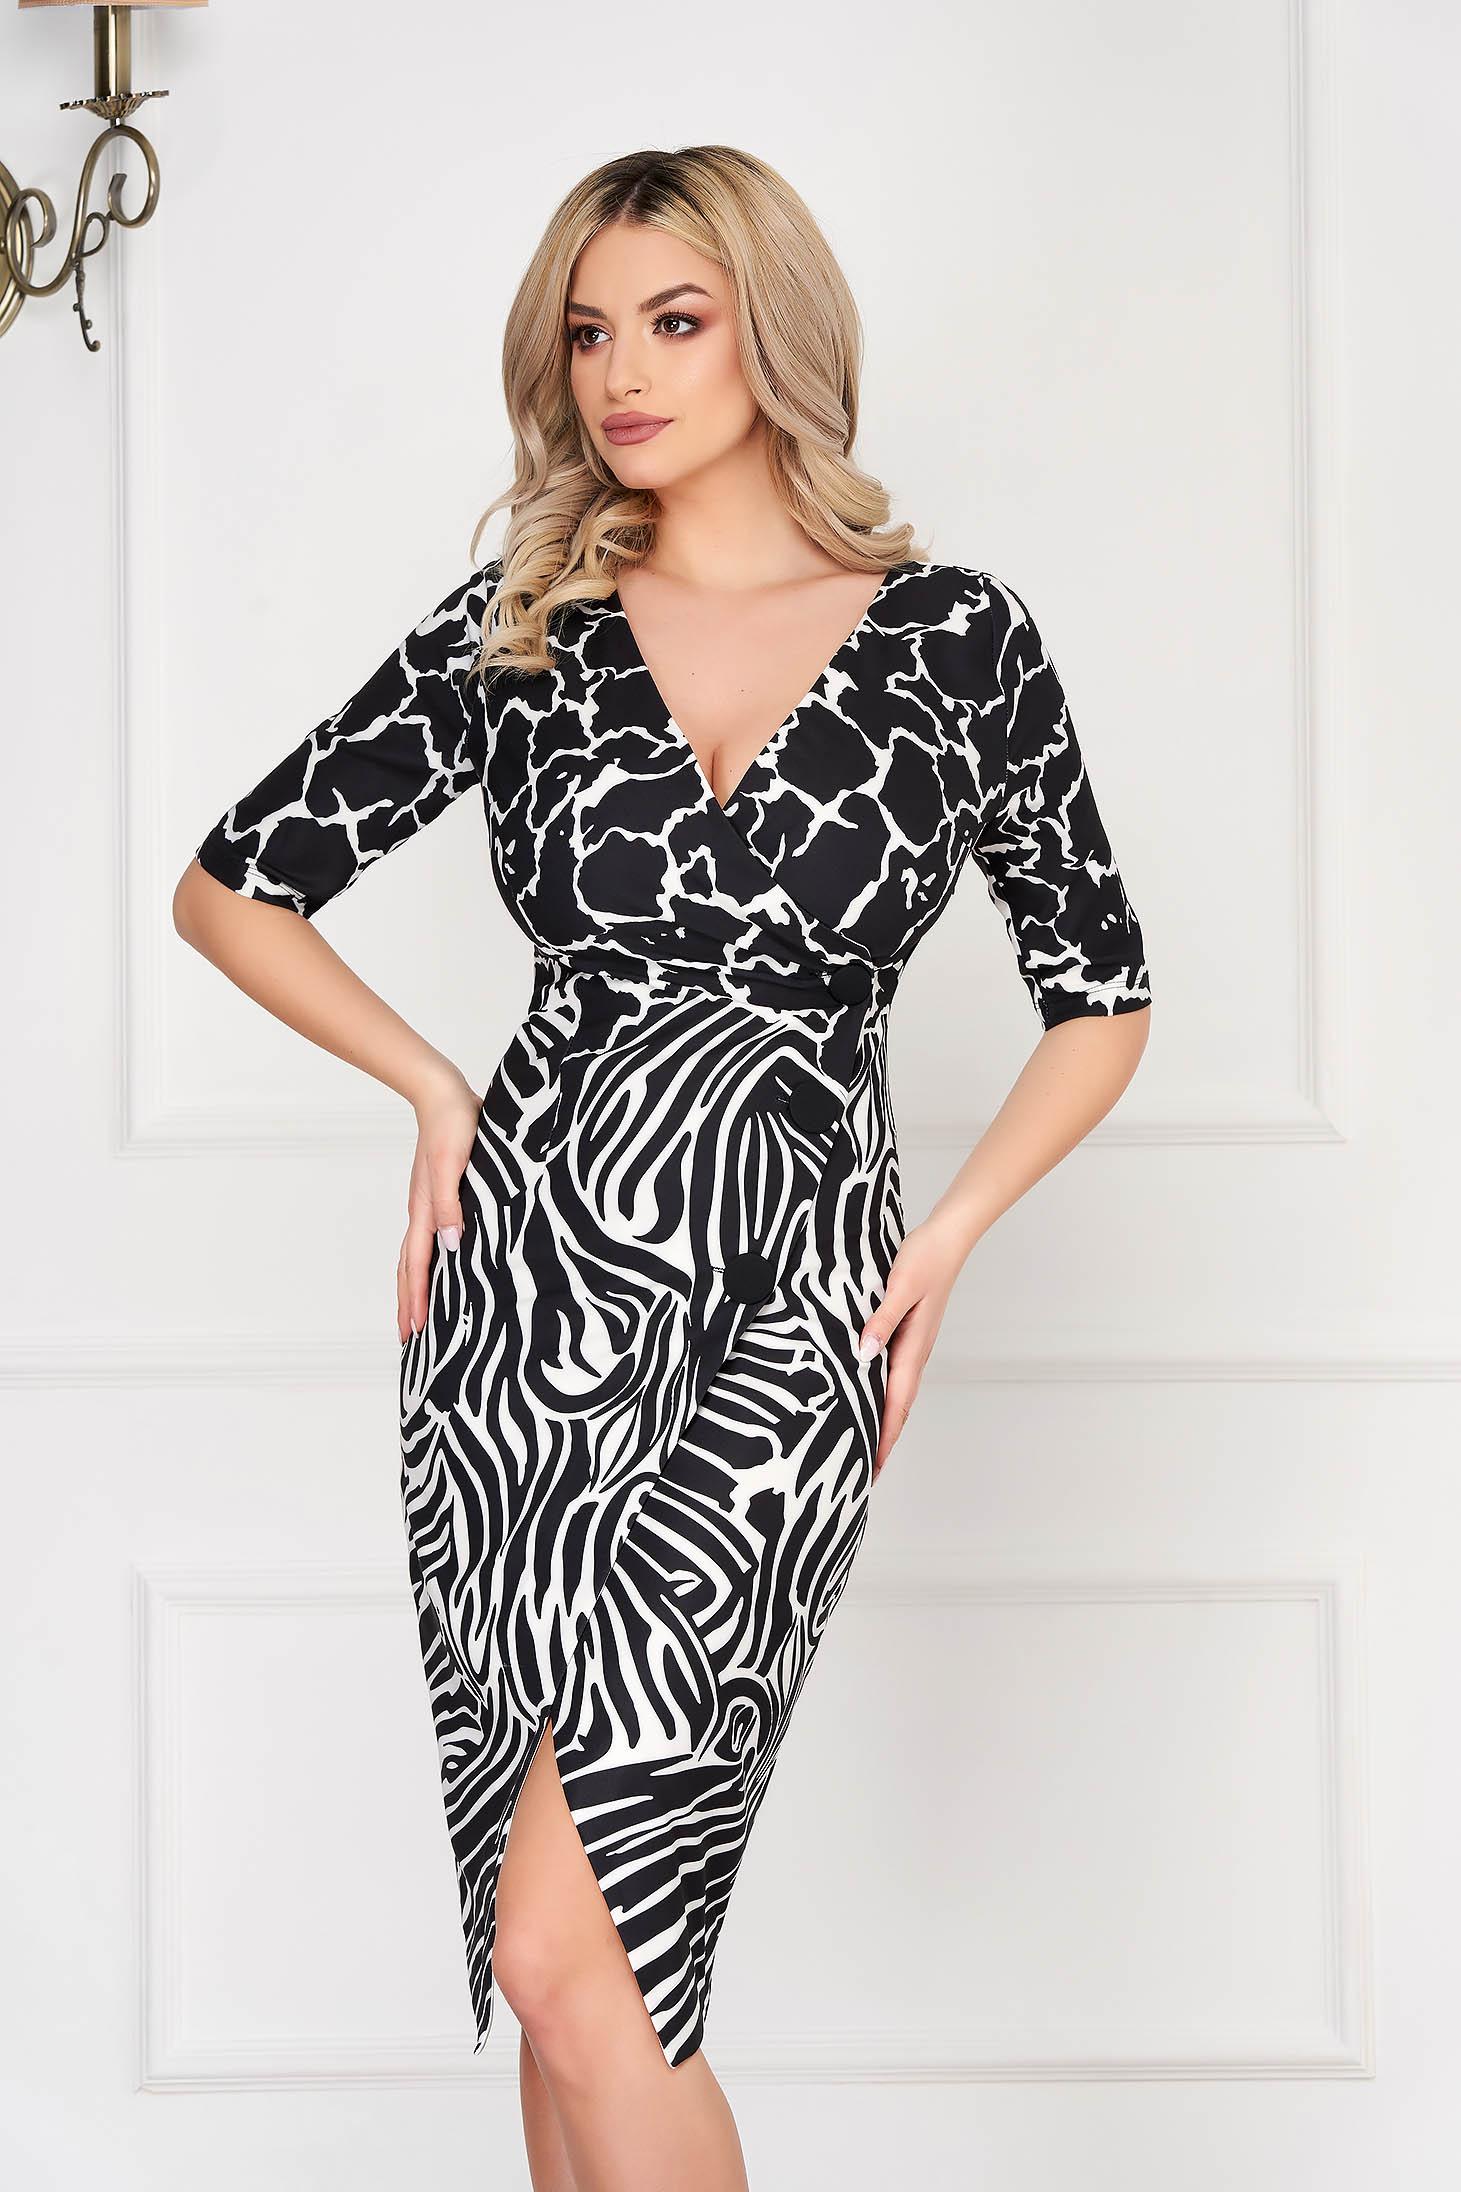 Black dress office midi pencil wrap over skirt slightly elastic fabric